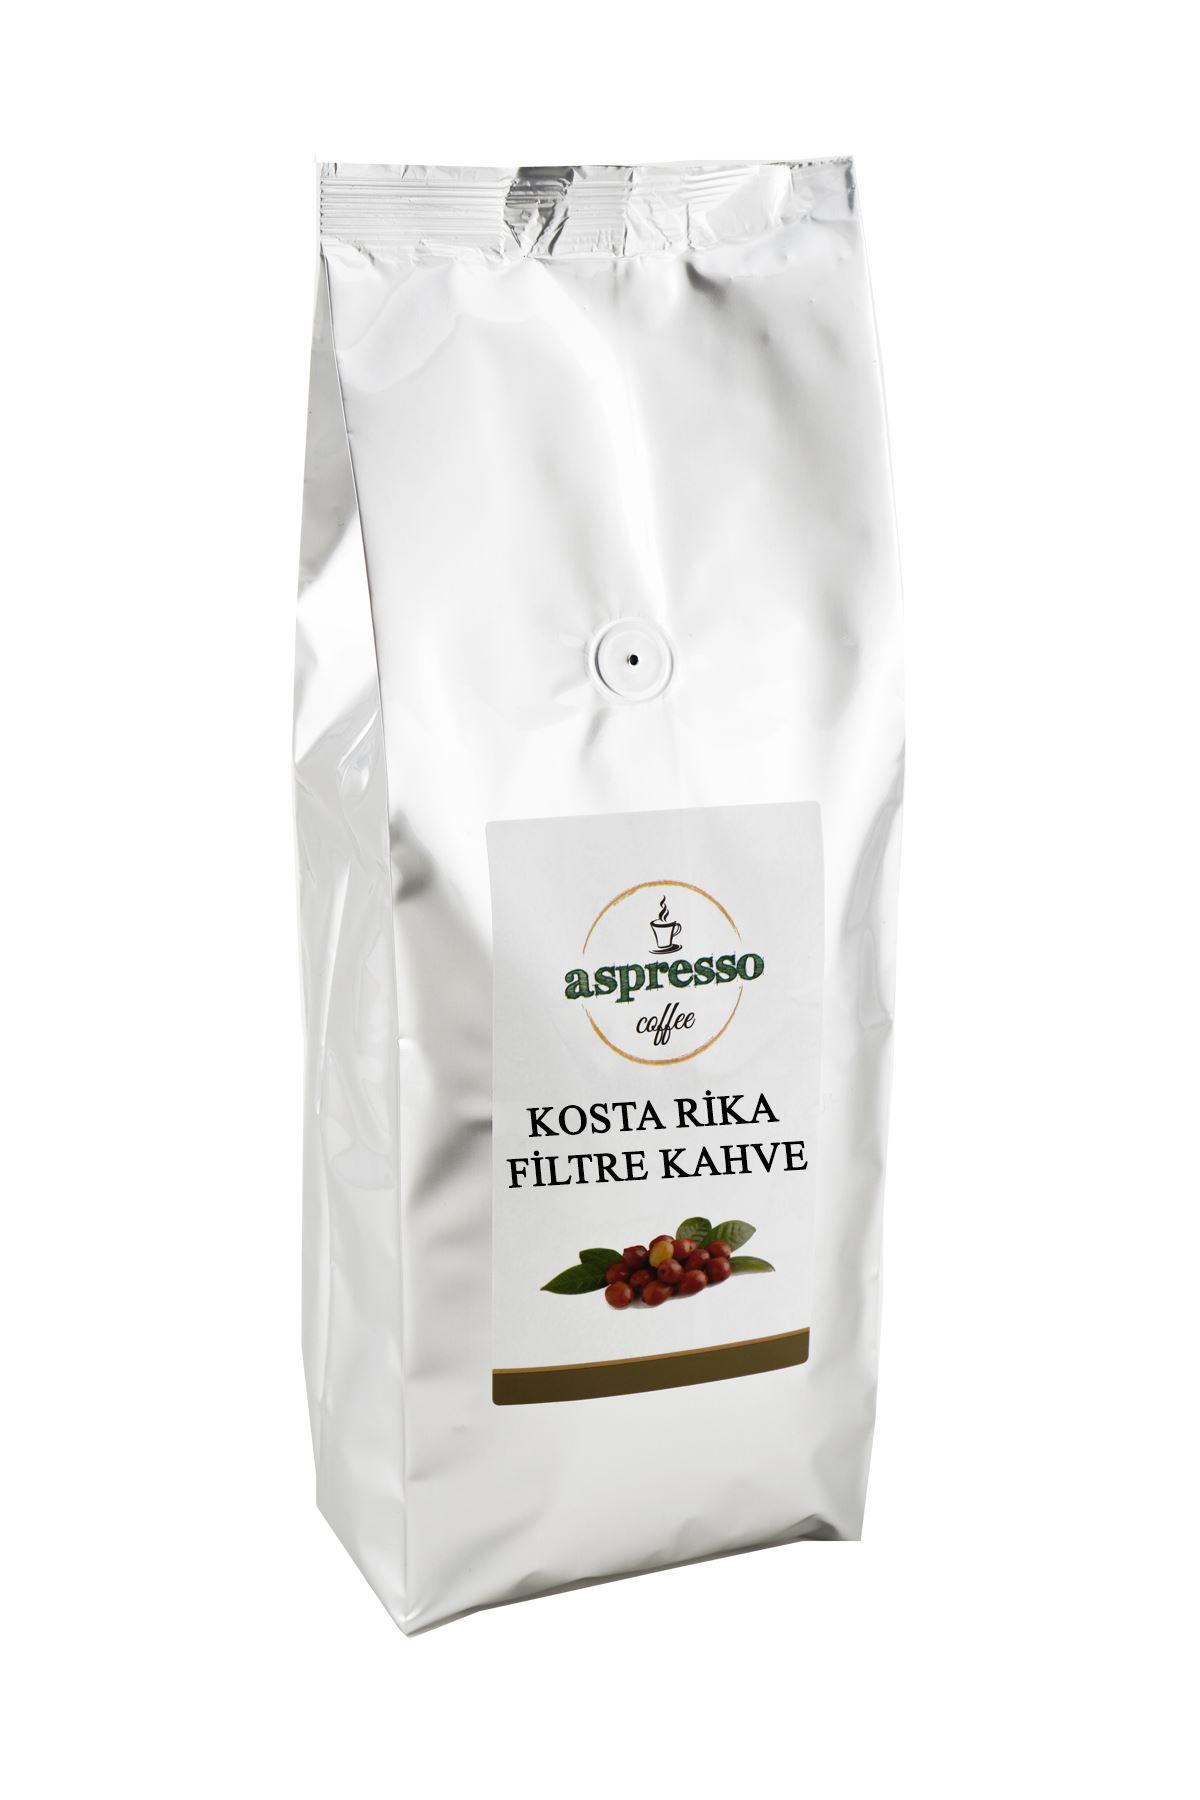 Costa Rica Filtre Kahve 1000 gr.